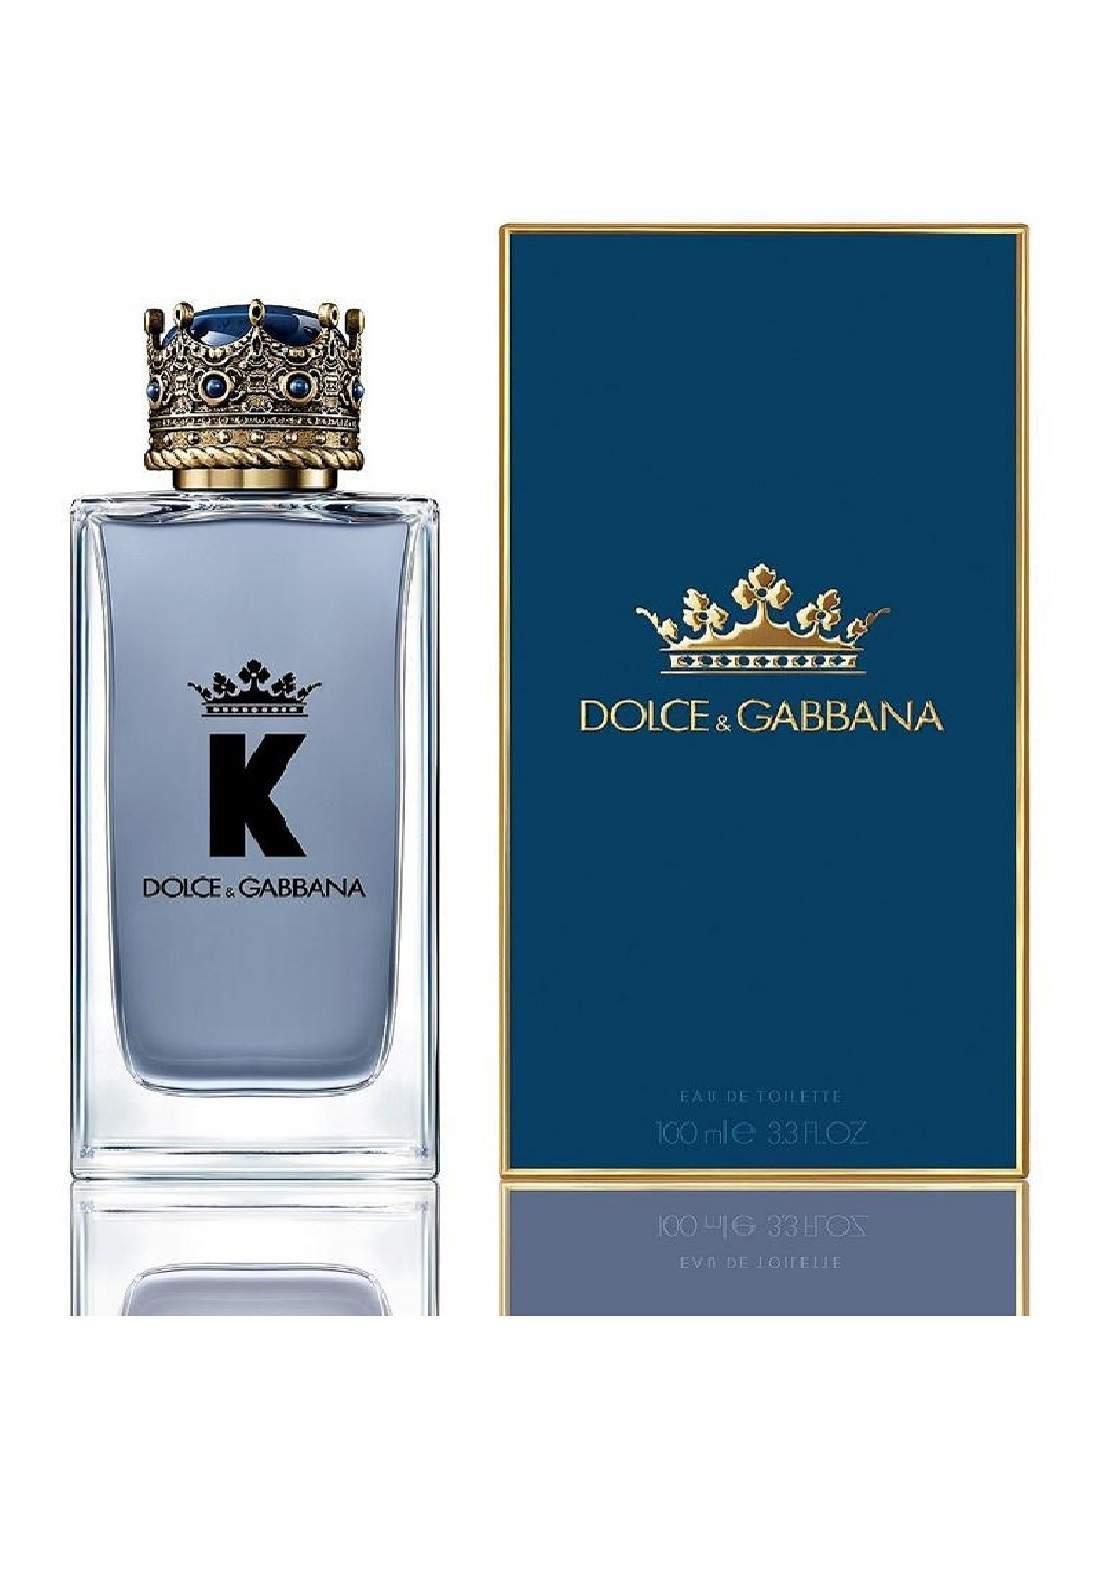 Dolce & Gabbana K edt 100 ml عطر رجالي